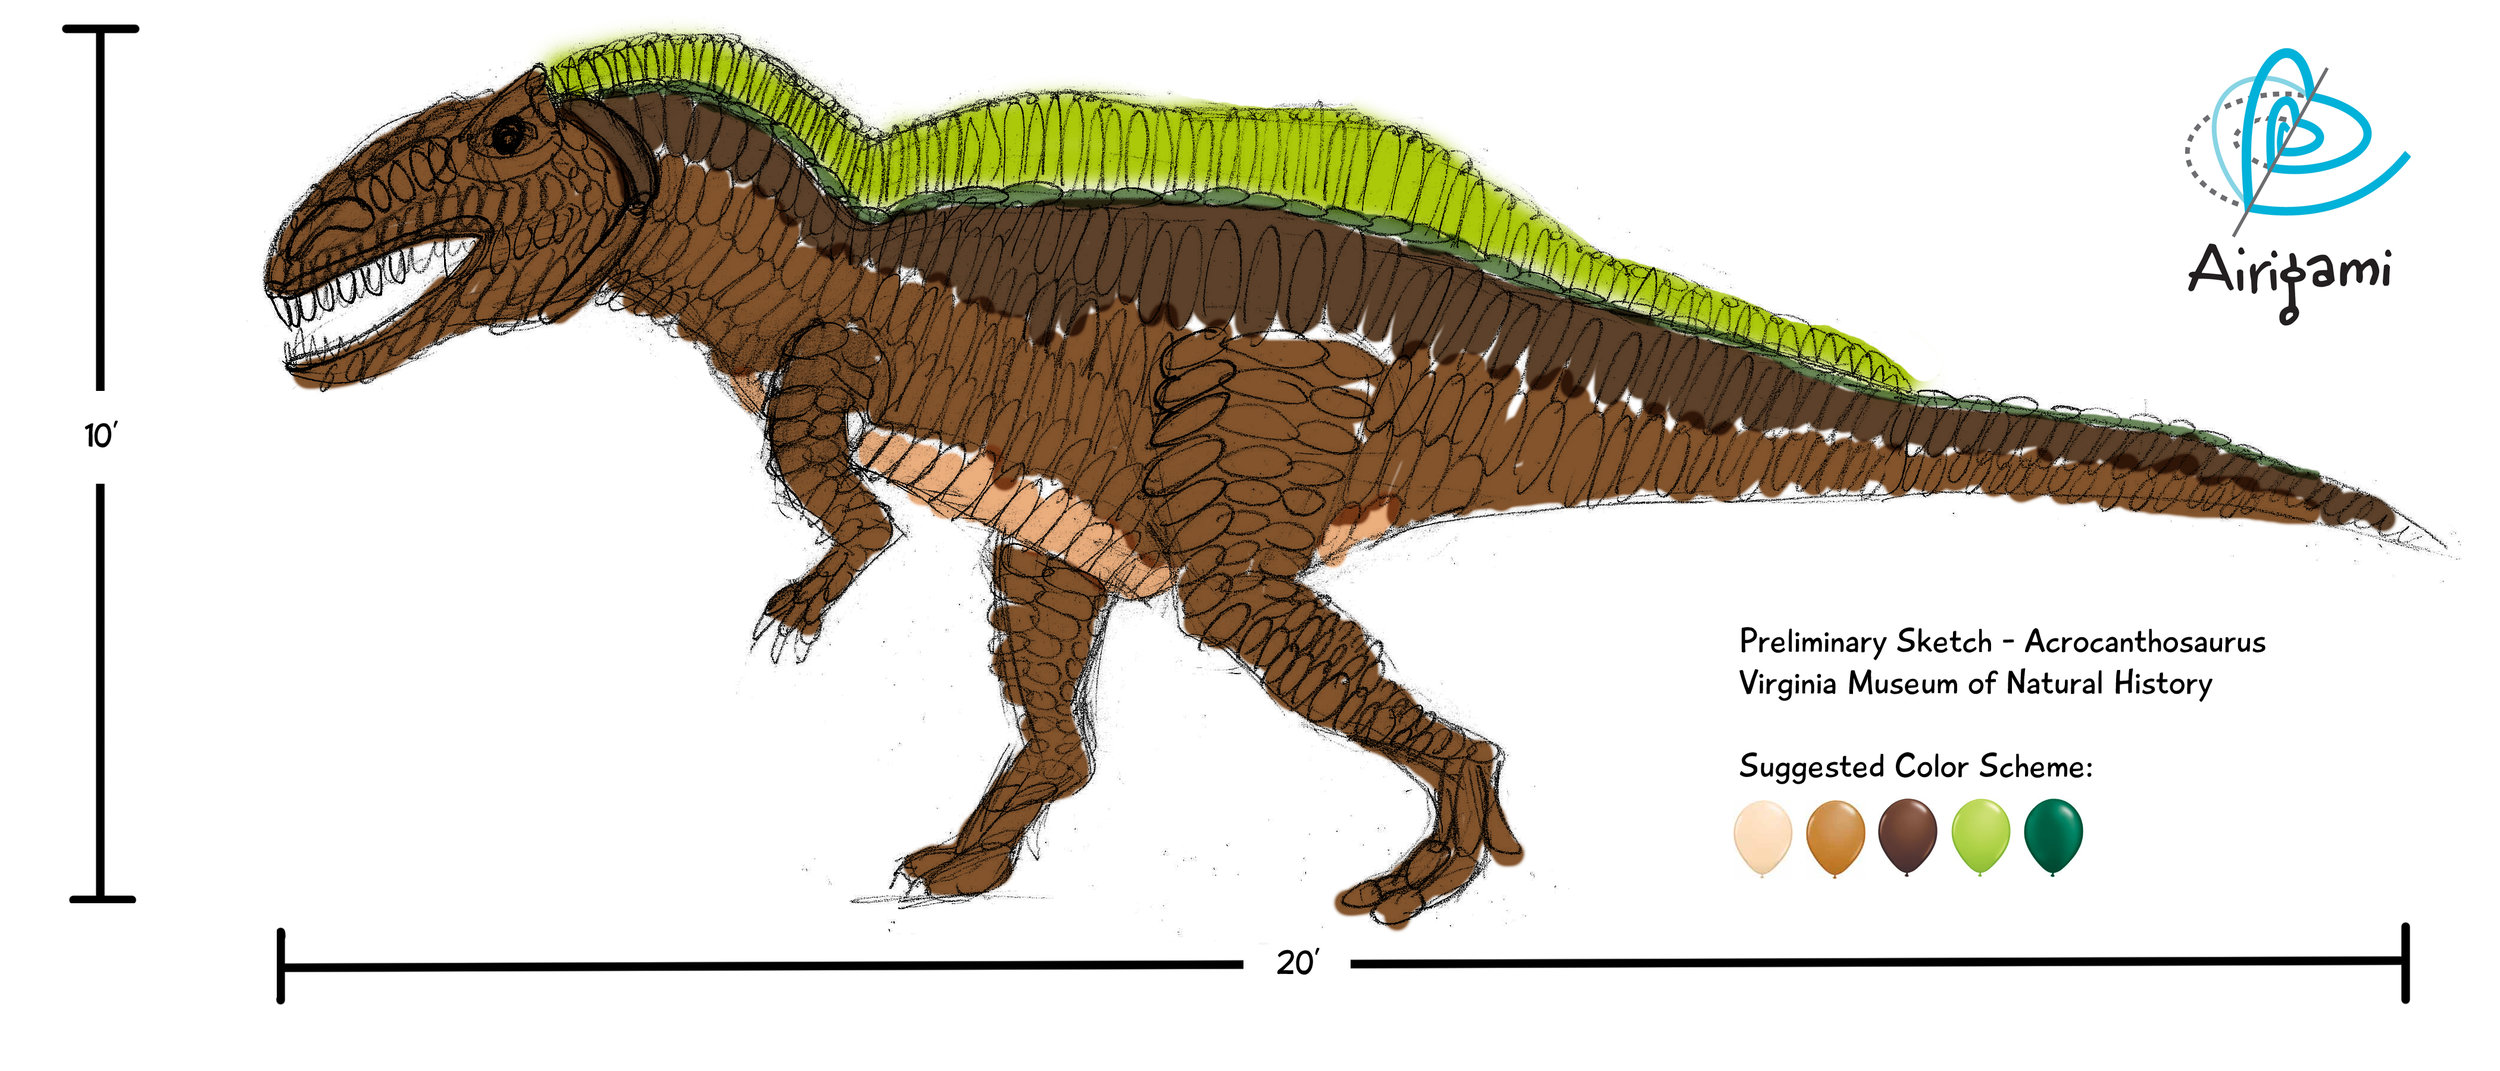 Balloon acrocanthosaurus concept sketch